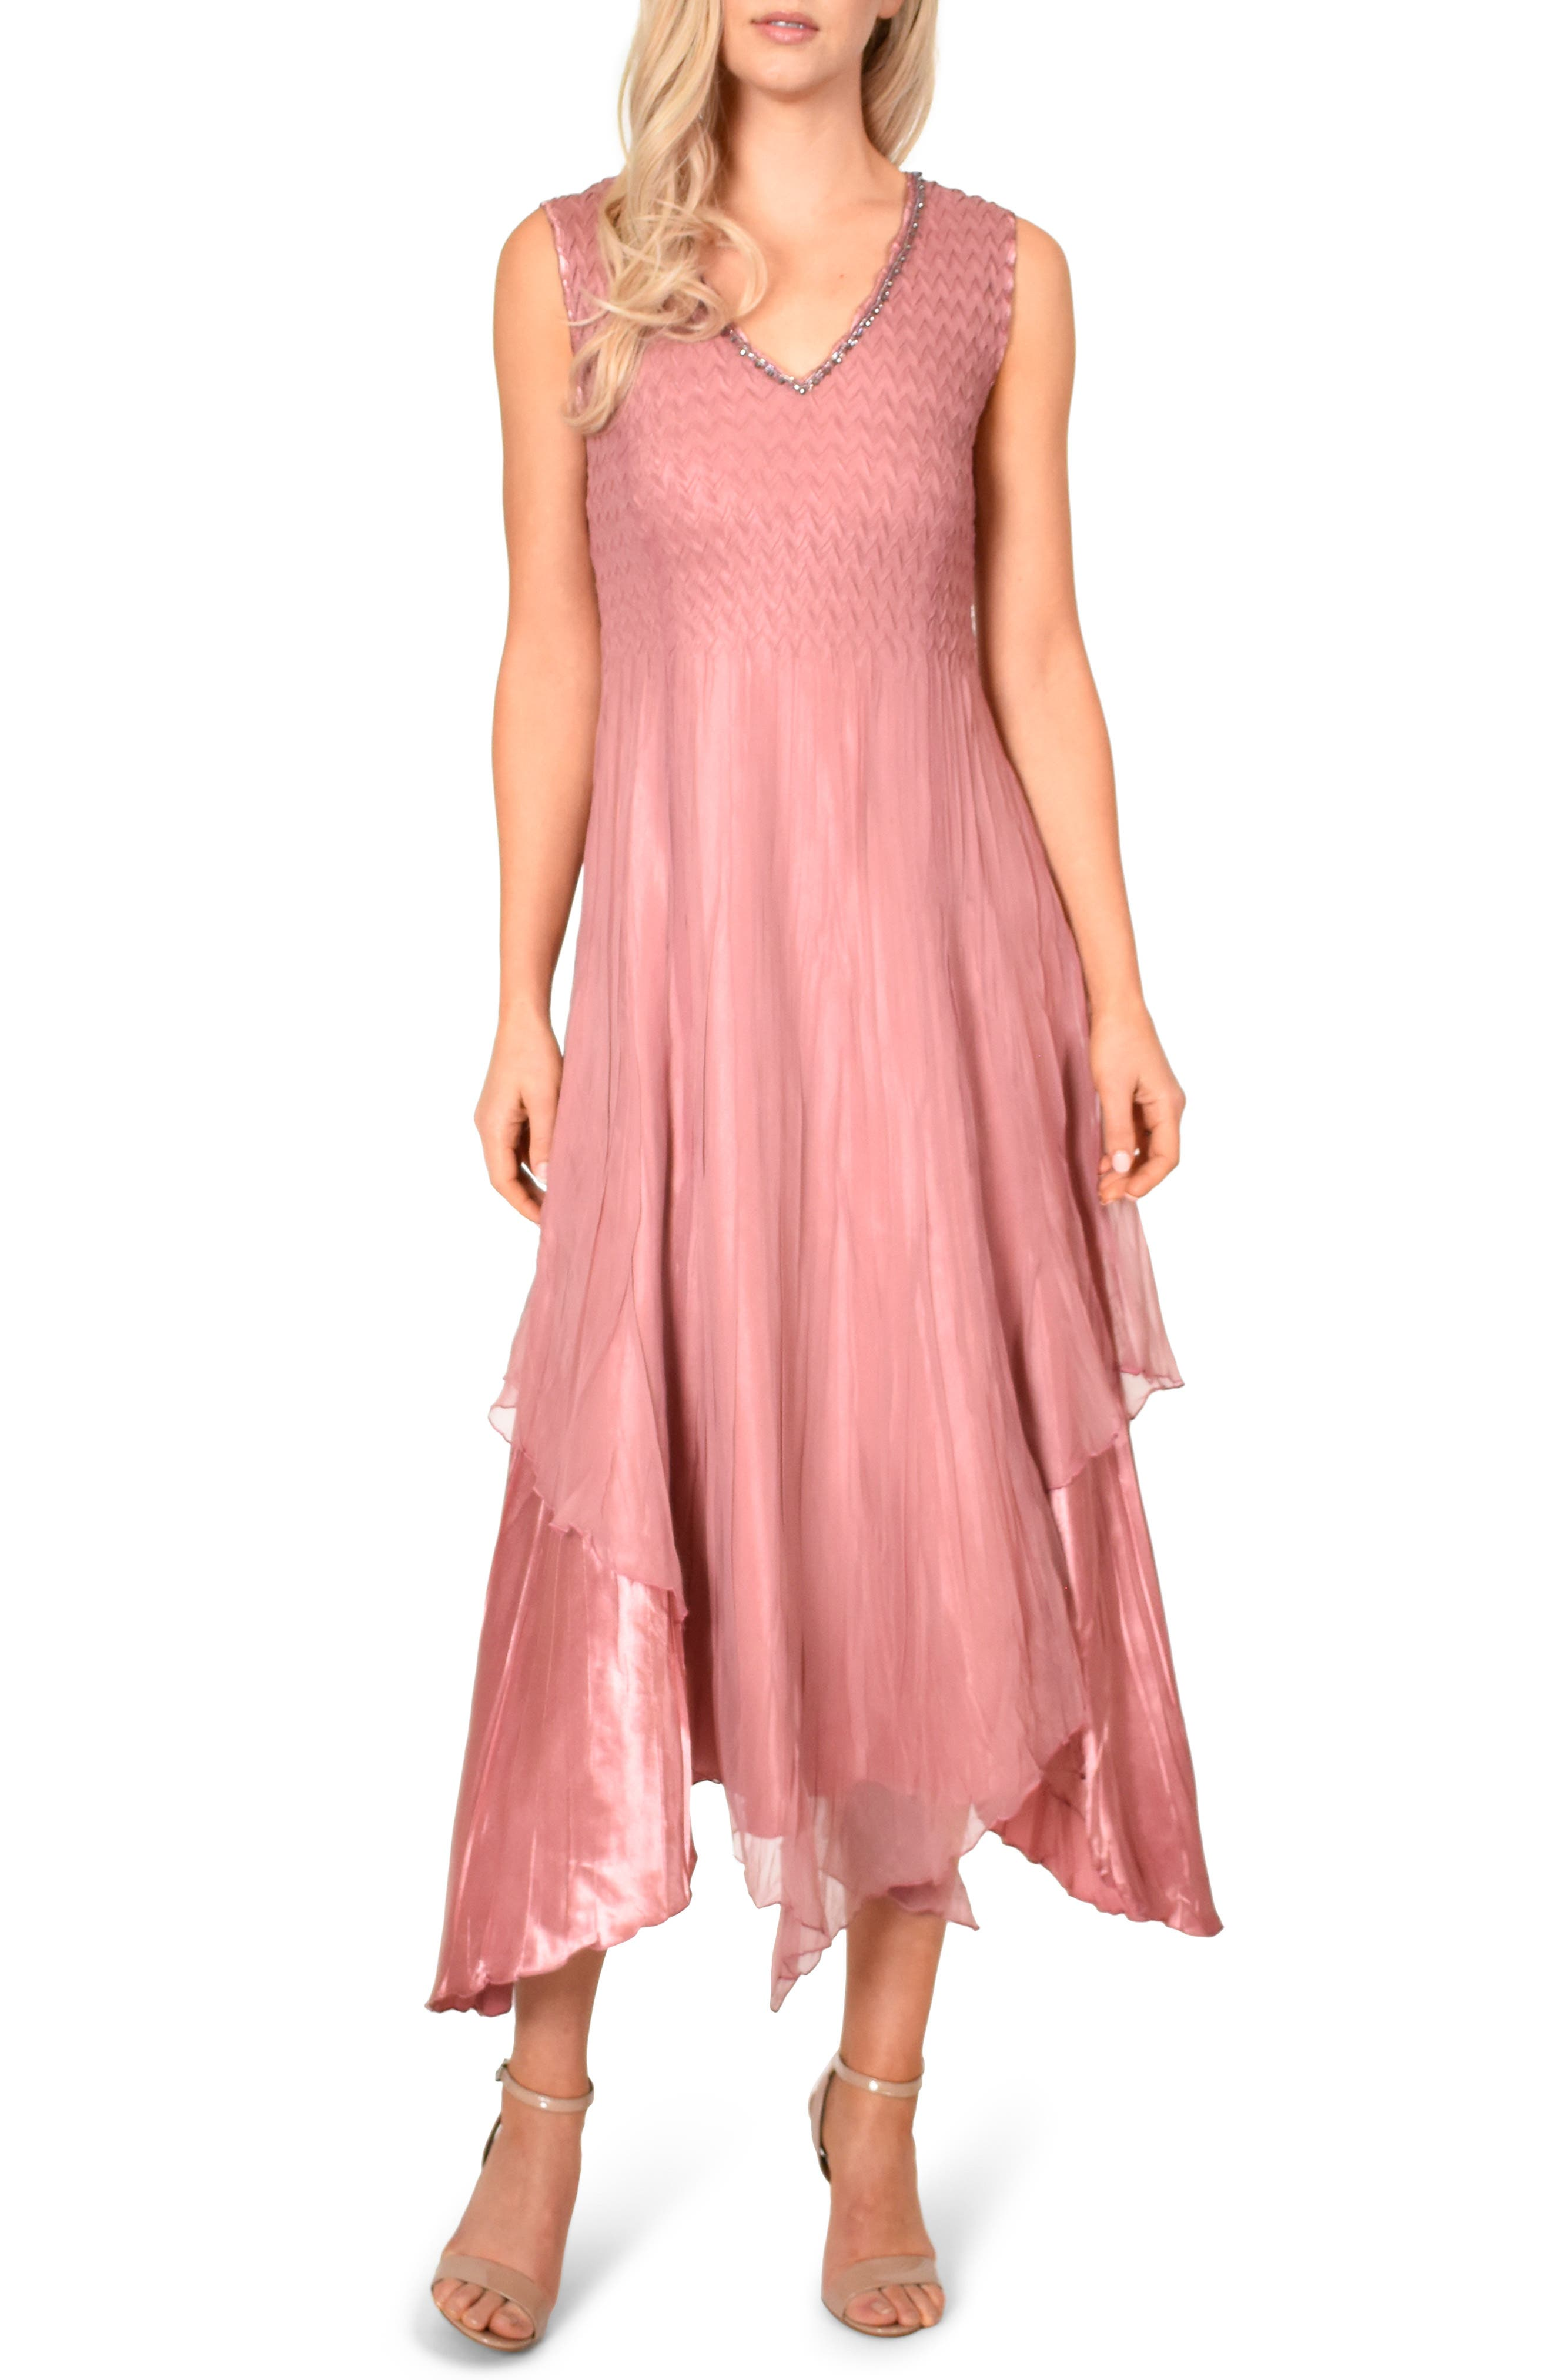 Komarov New Chiffon Sleeveless Evening Dress With Shawl, Pink